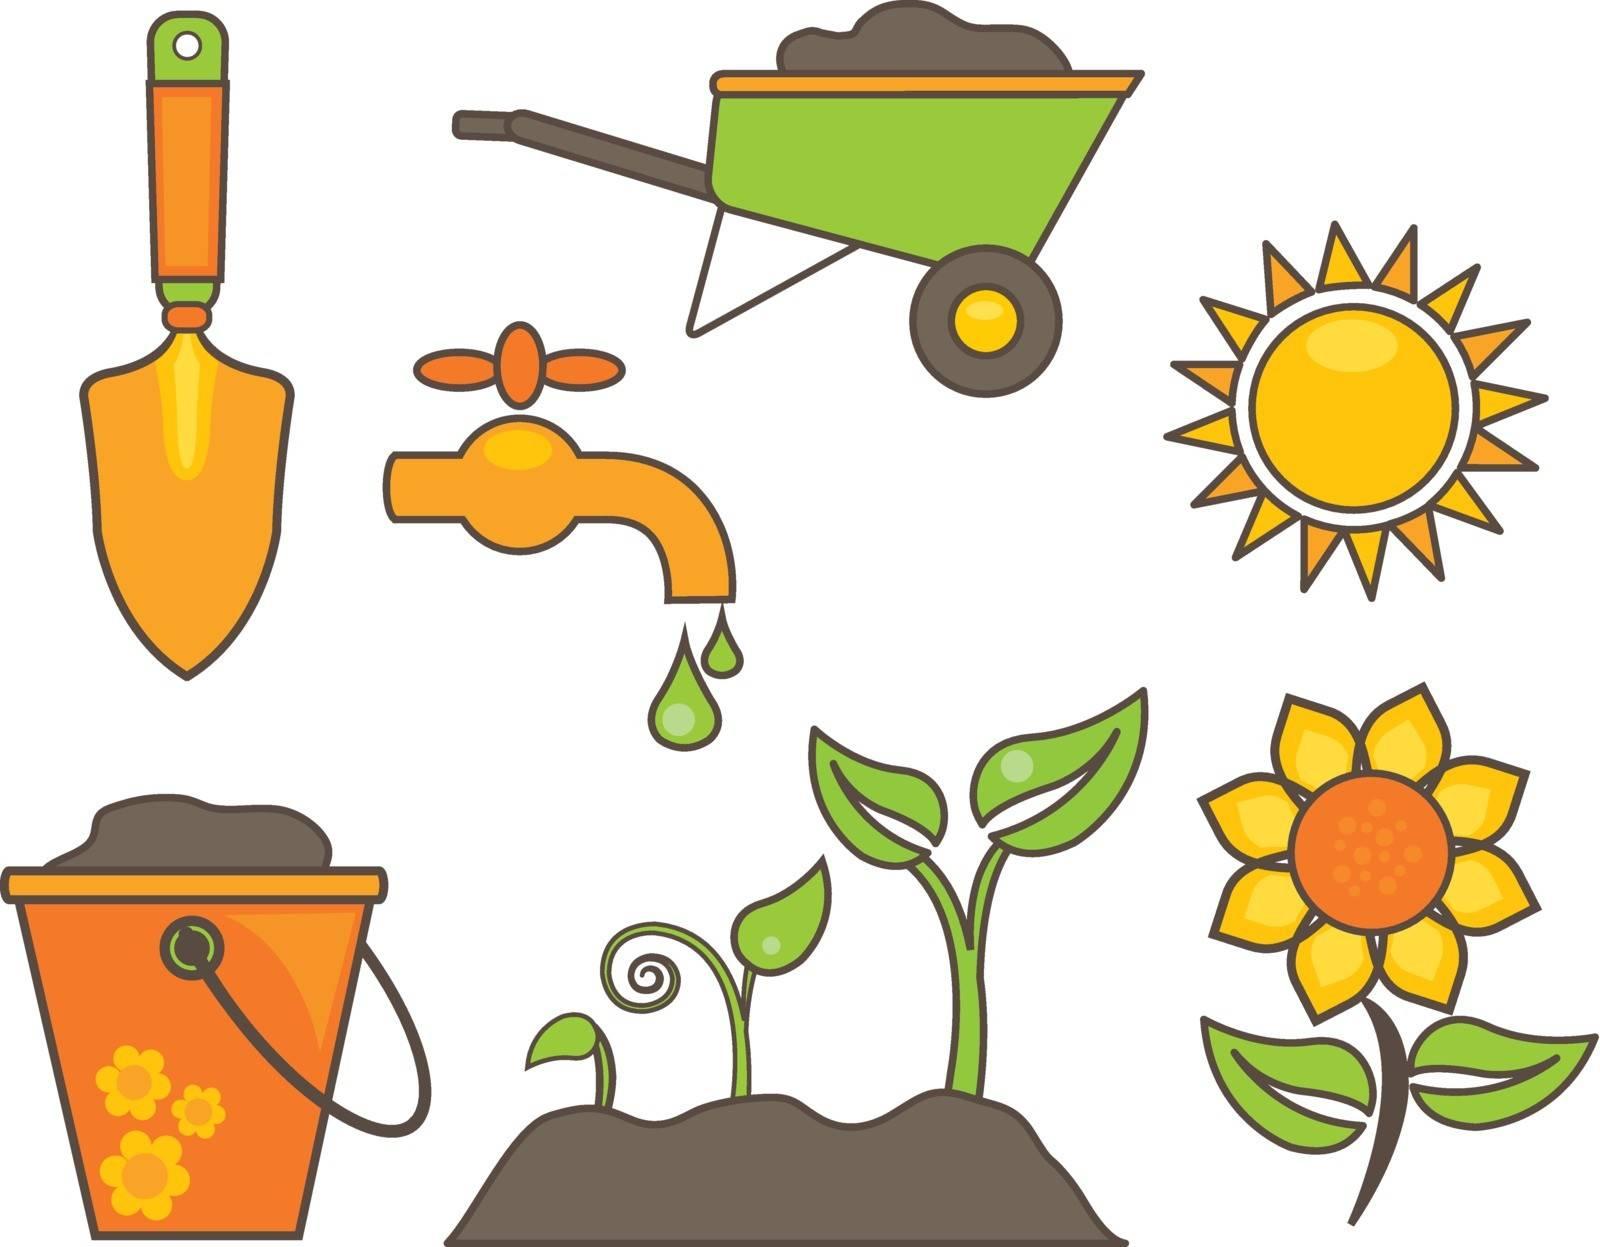 gardening equipment illustration vector eps.10